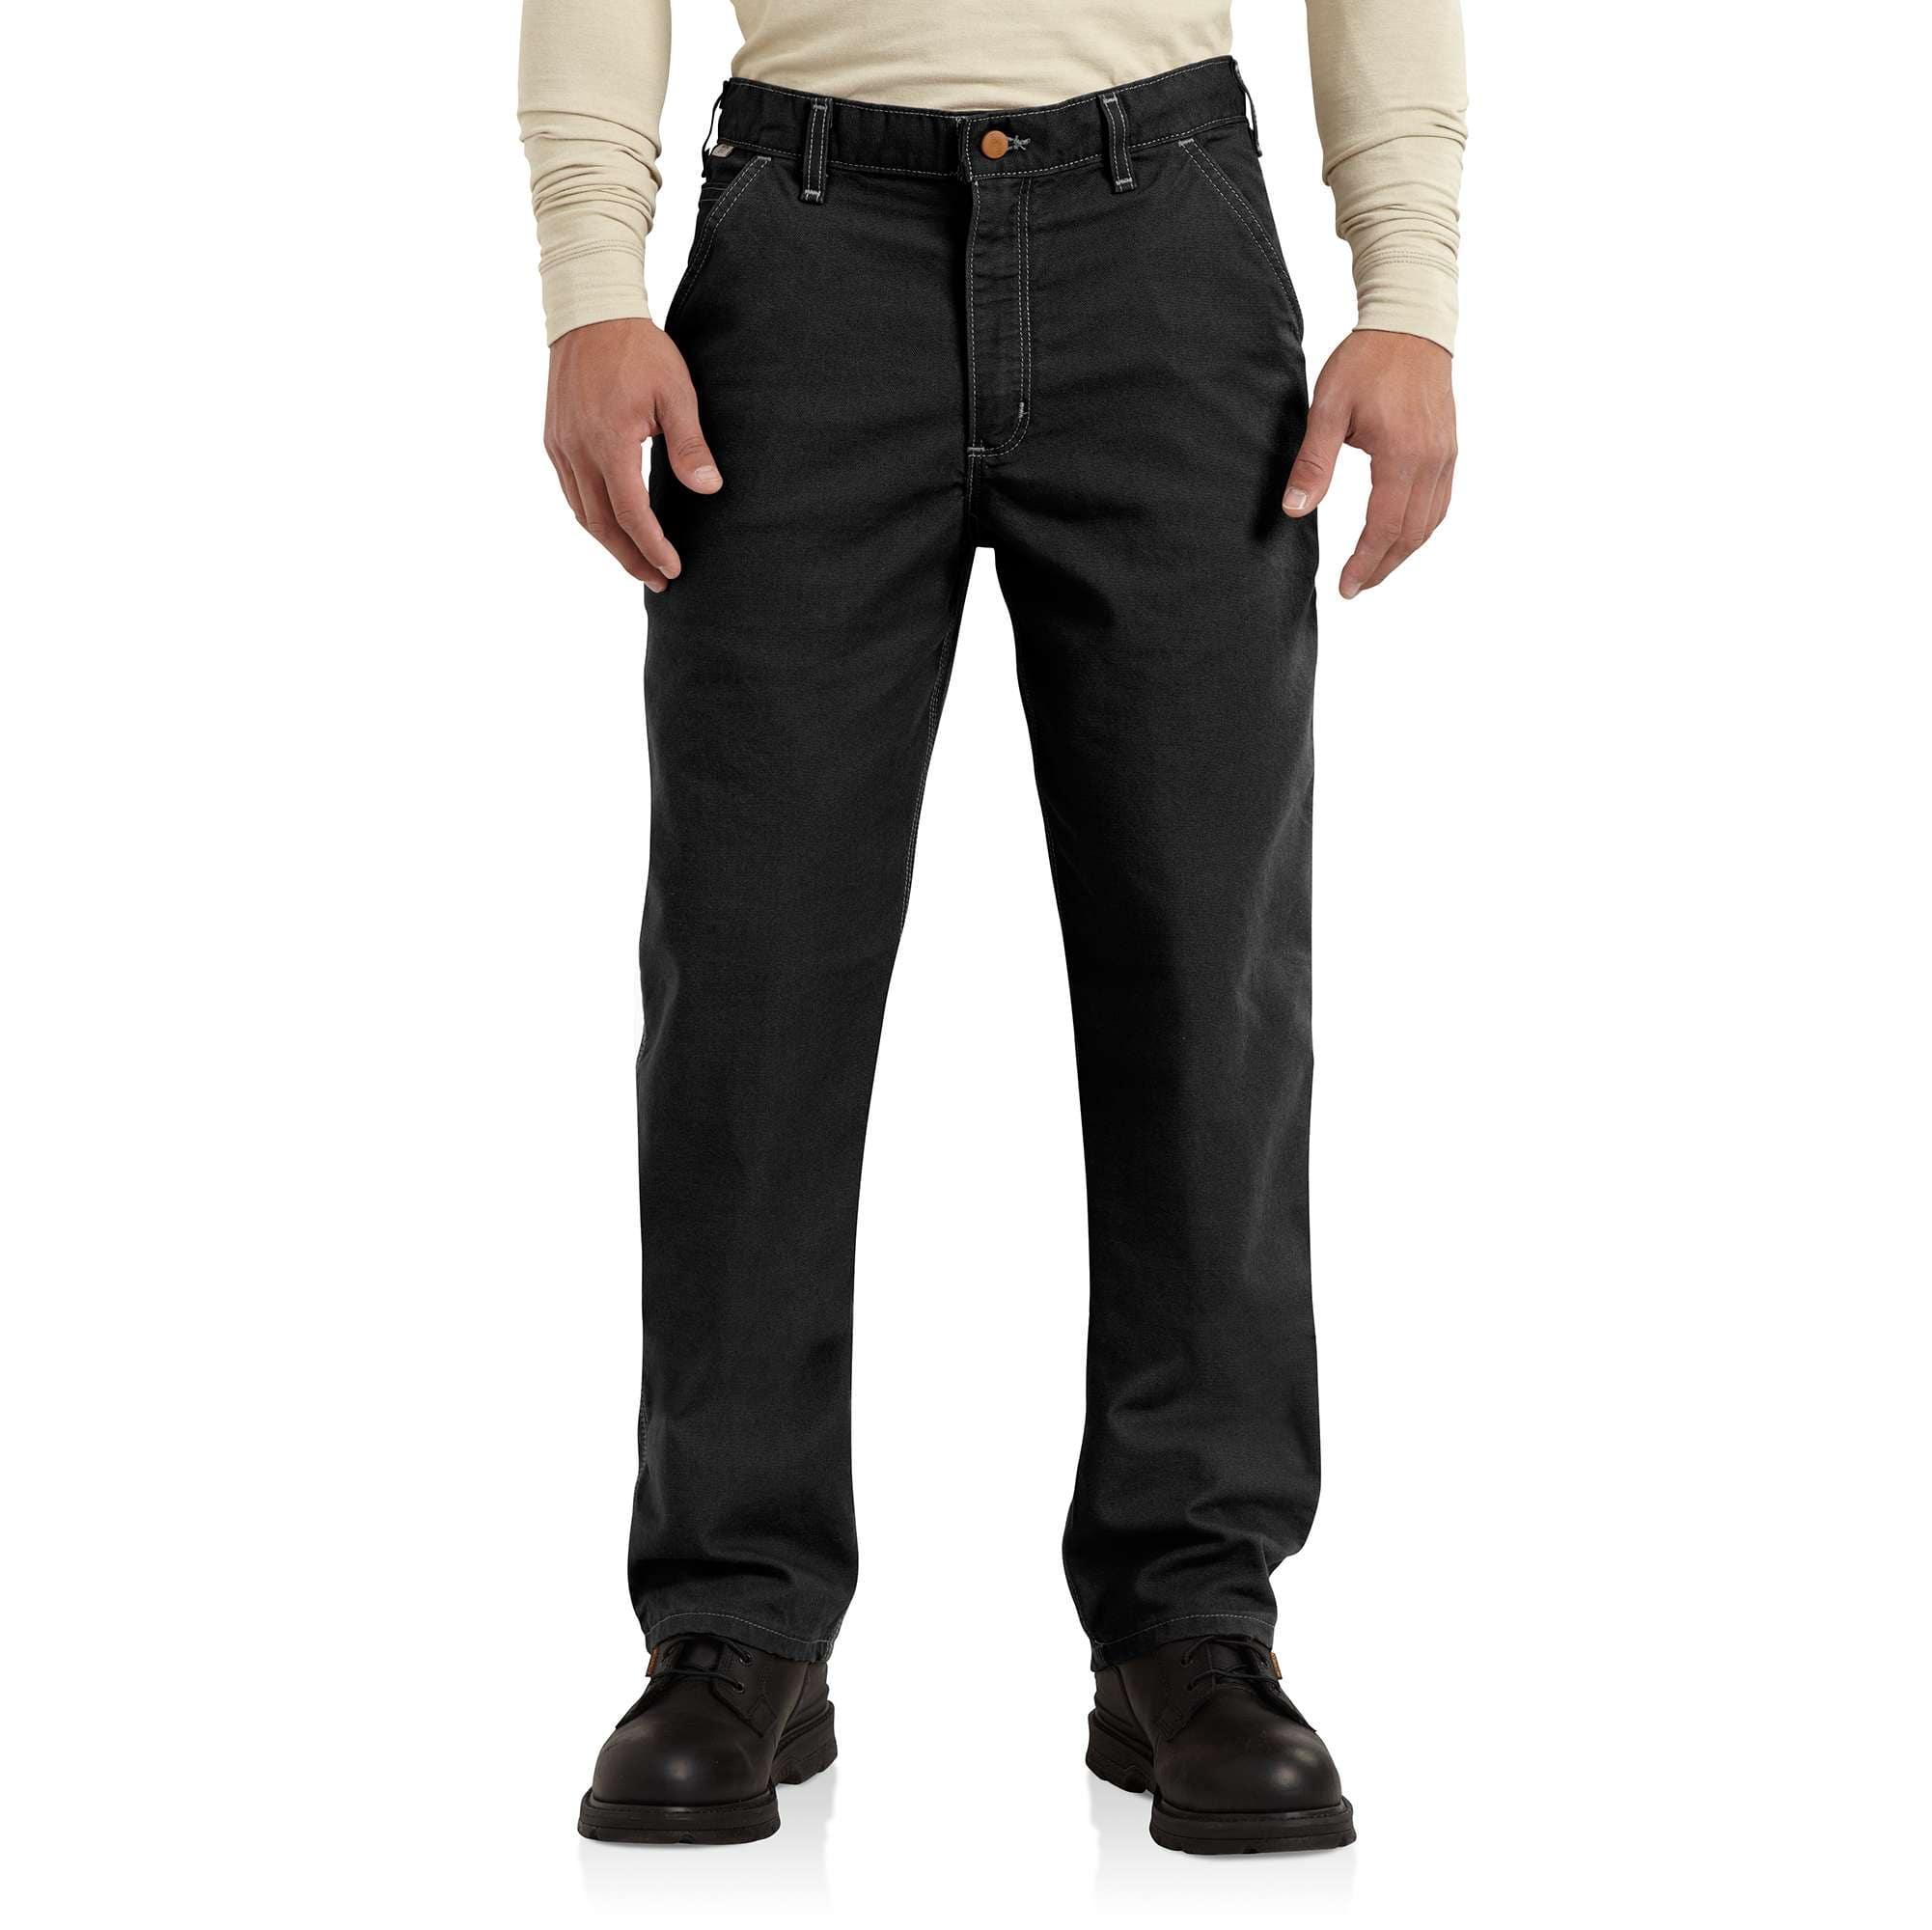 Men/'s 34x32 Carhart Fire Resistant Flame Resistant FR Cargo Jeans FR NFPA 2112